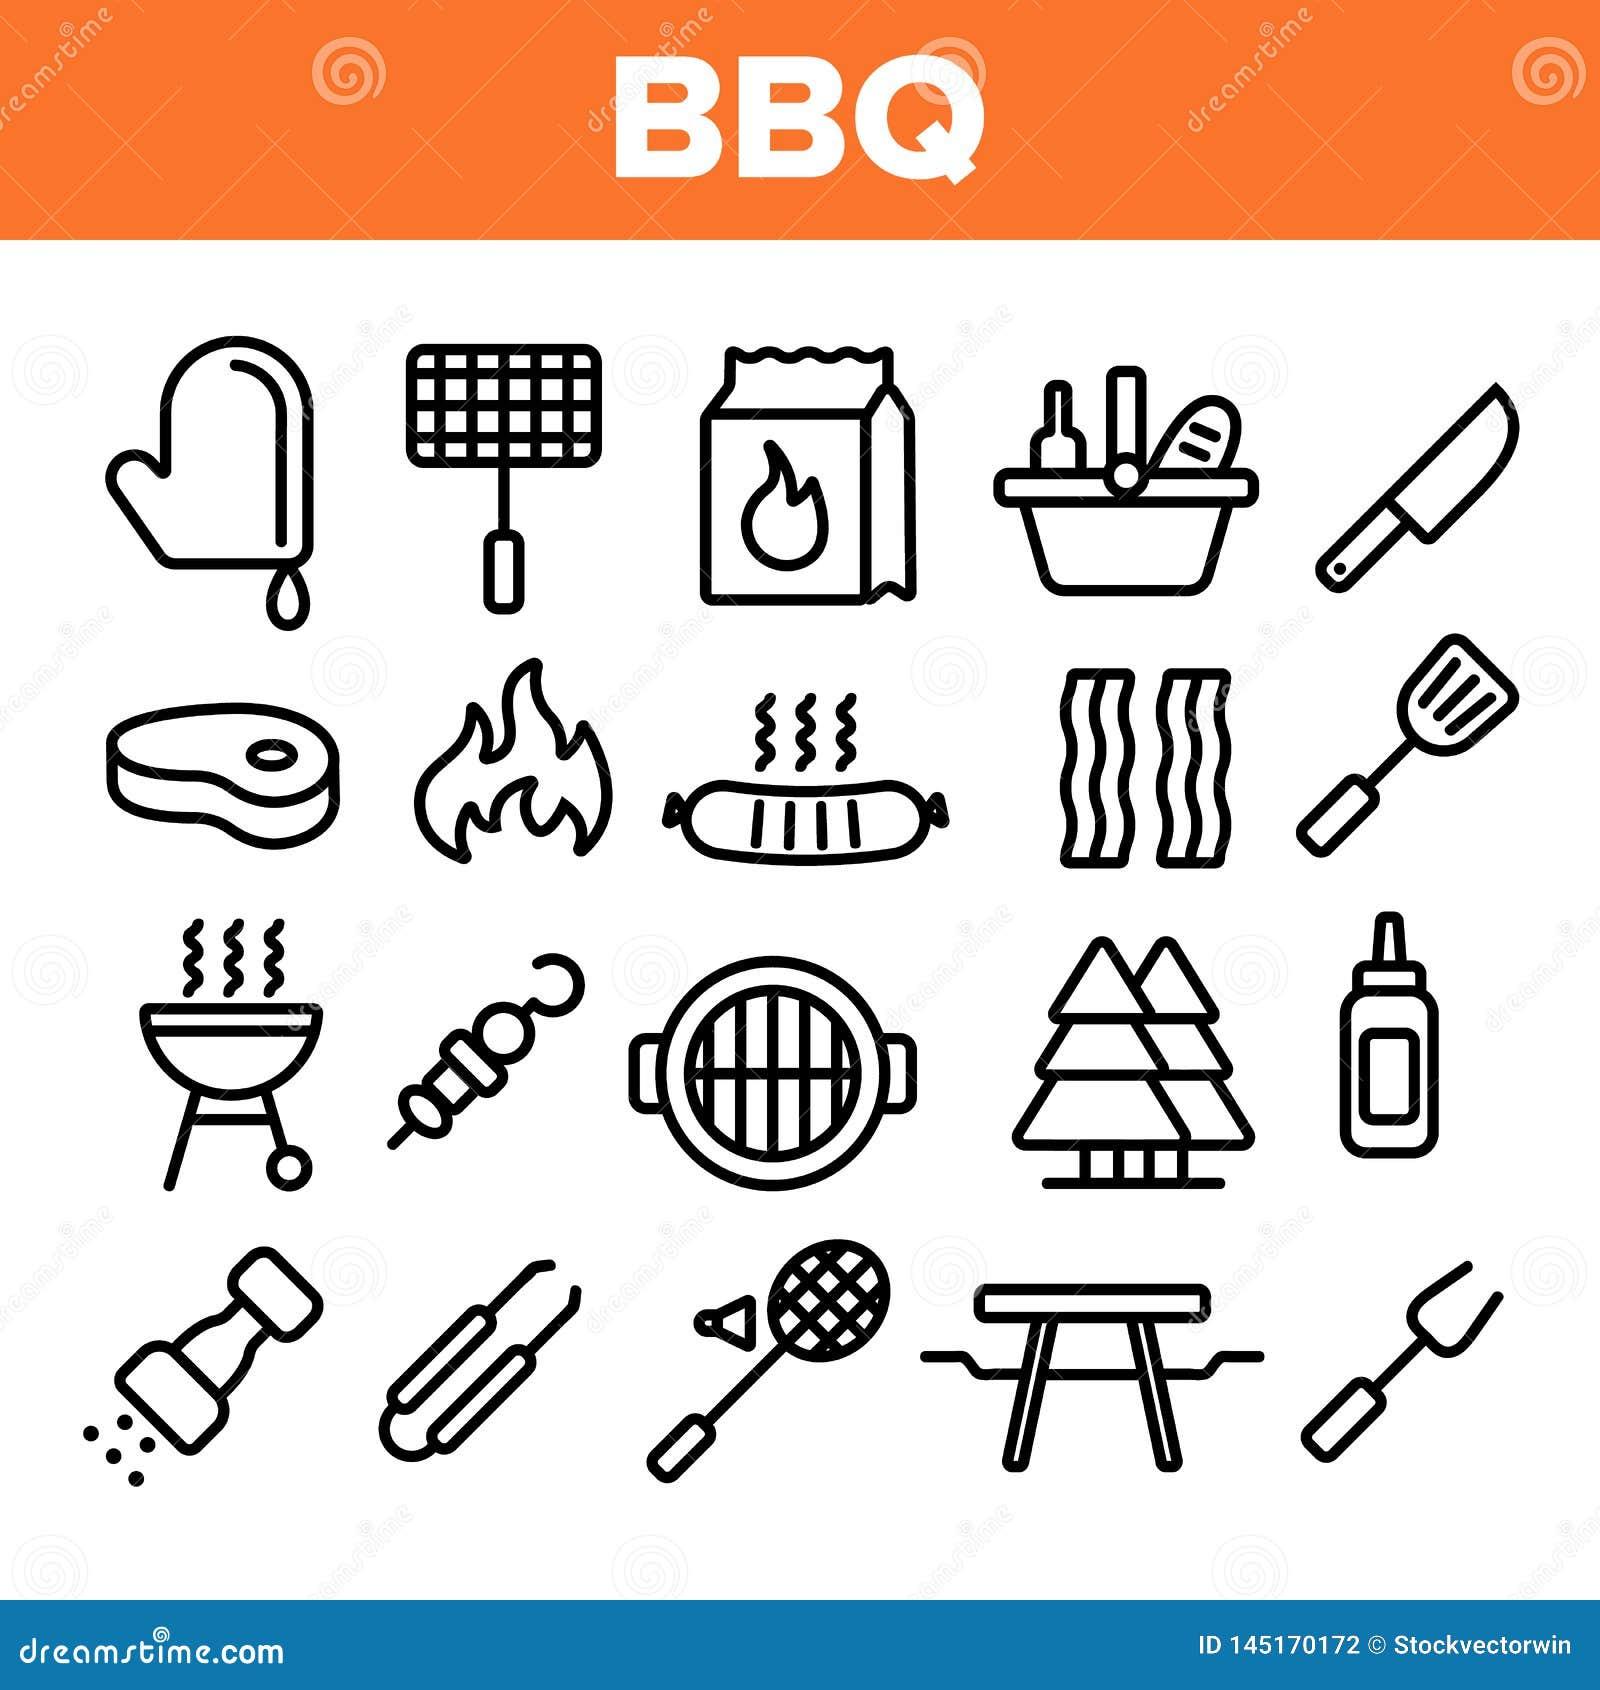 BBQ Equipment, Tools Linear Vector Icons Set